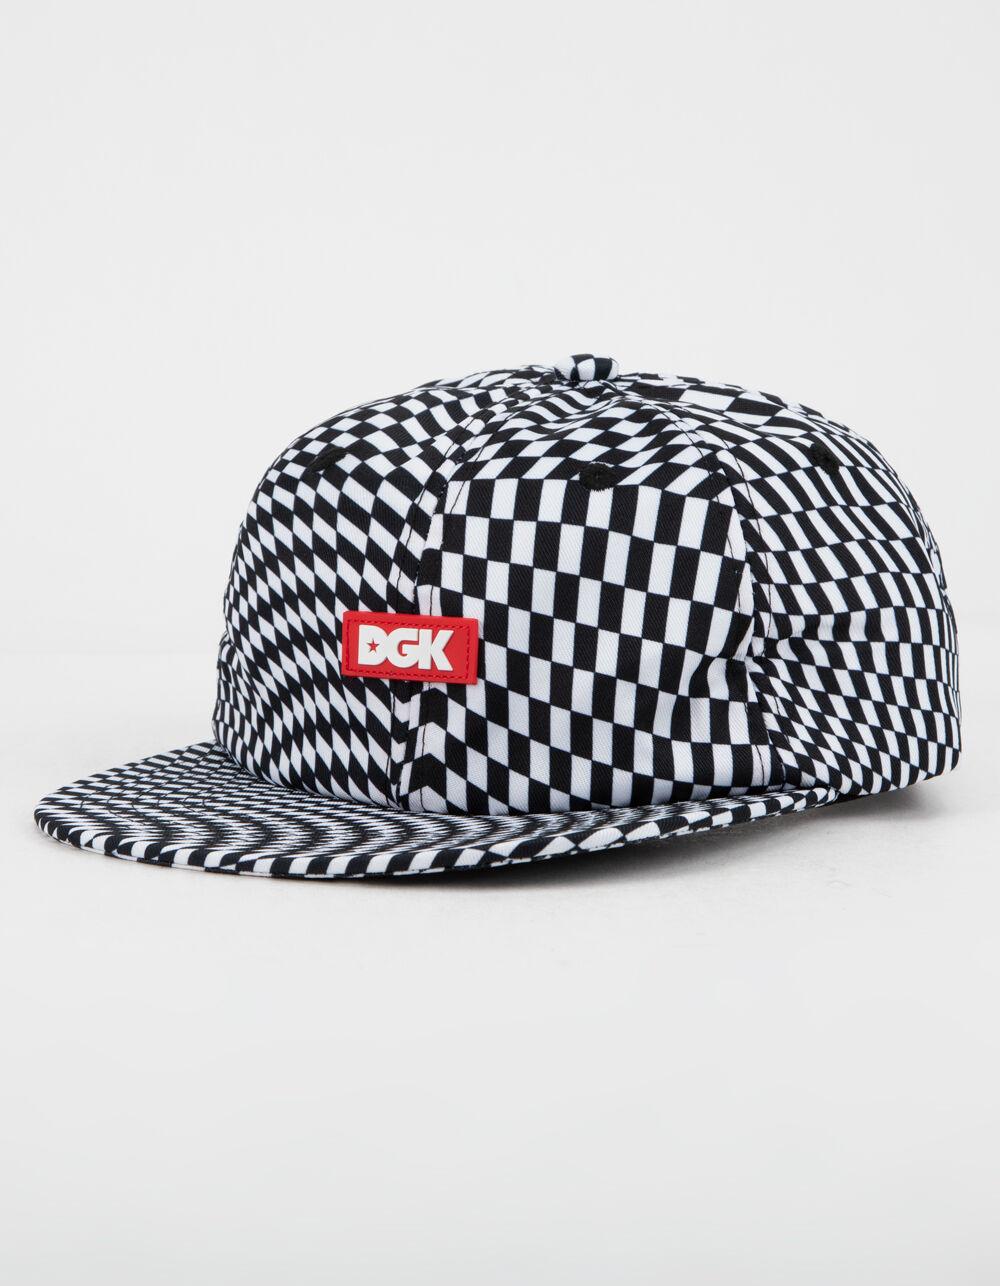 DGK Illusion Black & White Strapback Hat